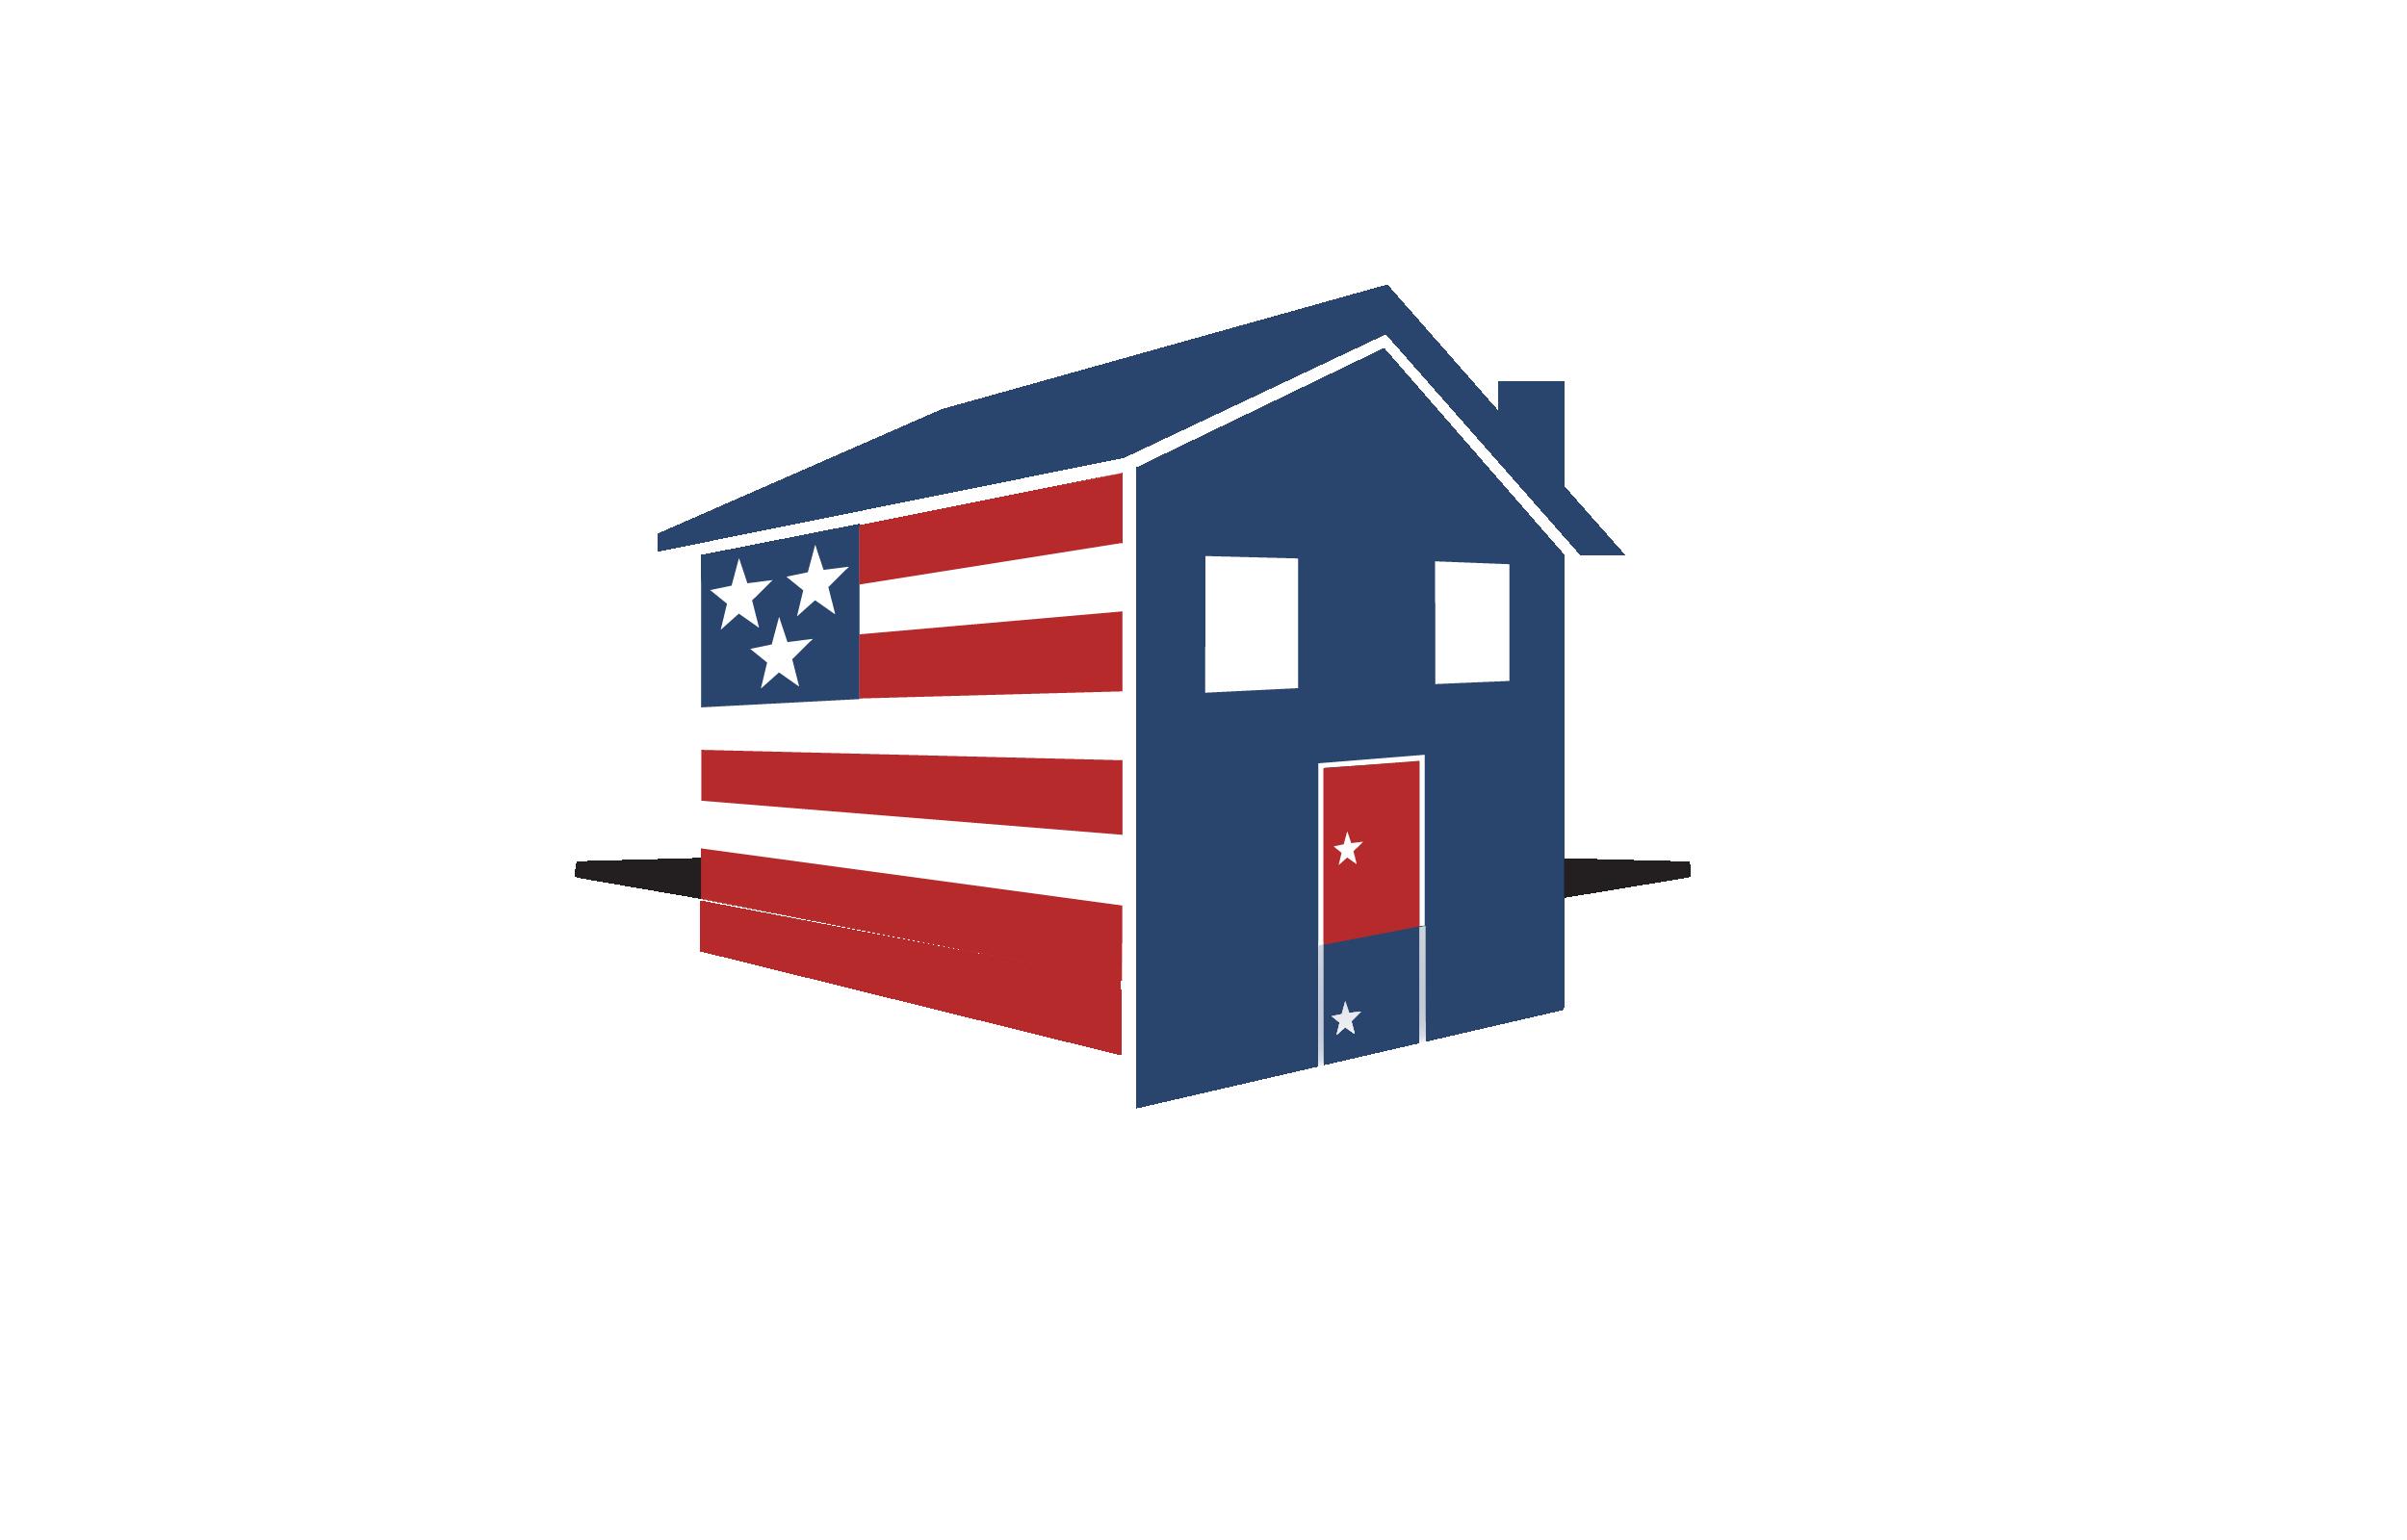 Neighborhood clipart city layout. Google likes us american